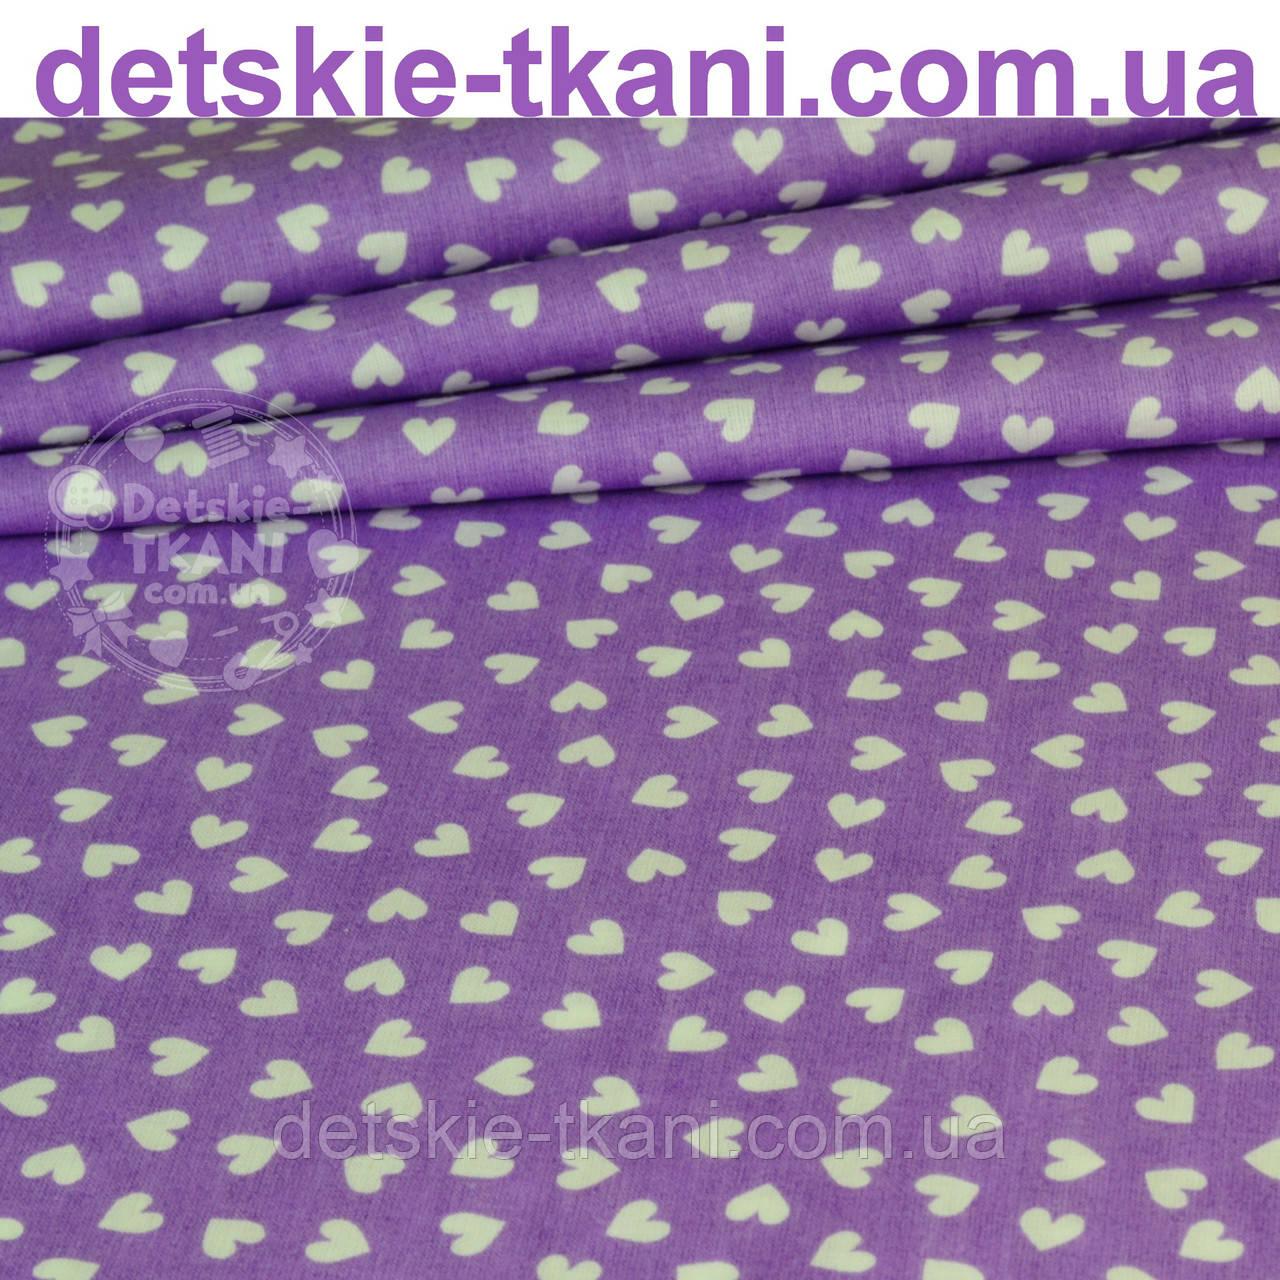 Ткань с белыми мини сердечками на сиреневом фоне (№ 817)